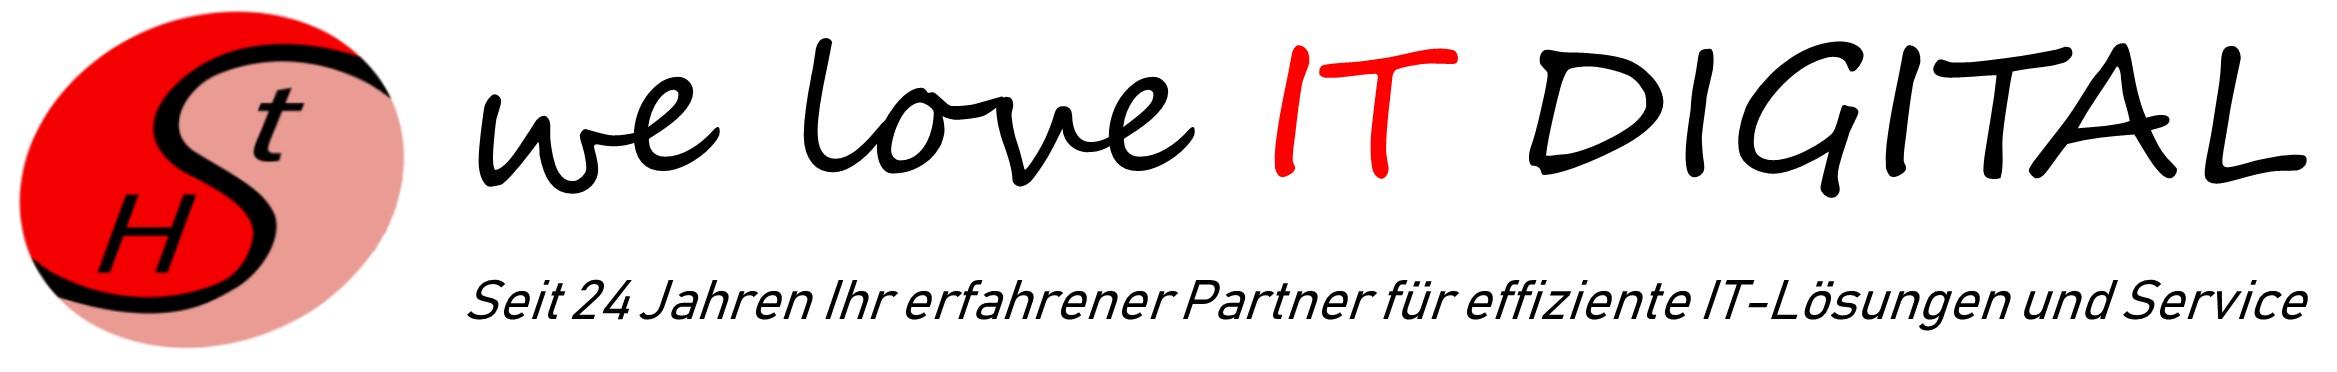 HSt trade & service GmbH